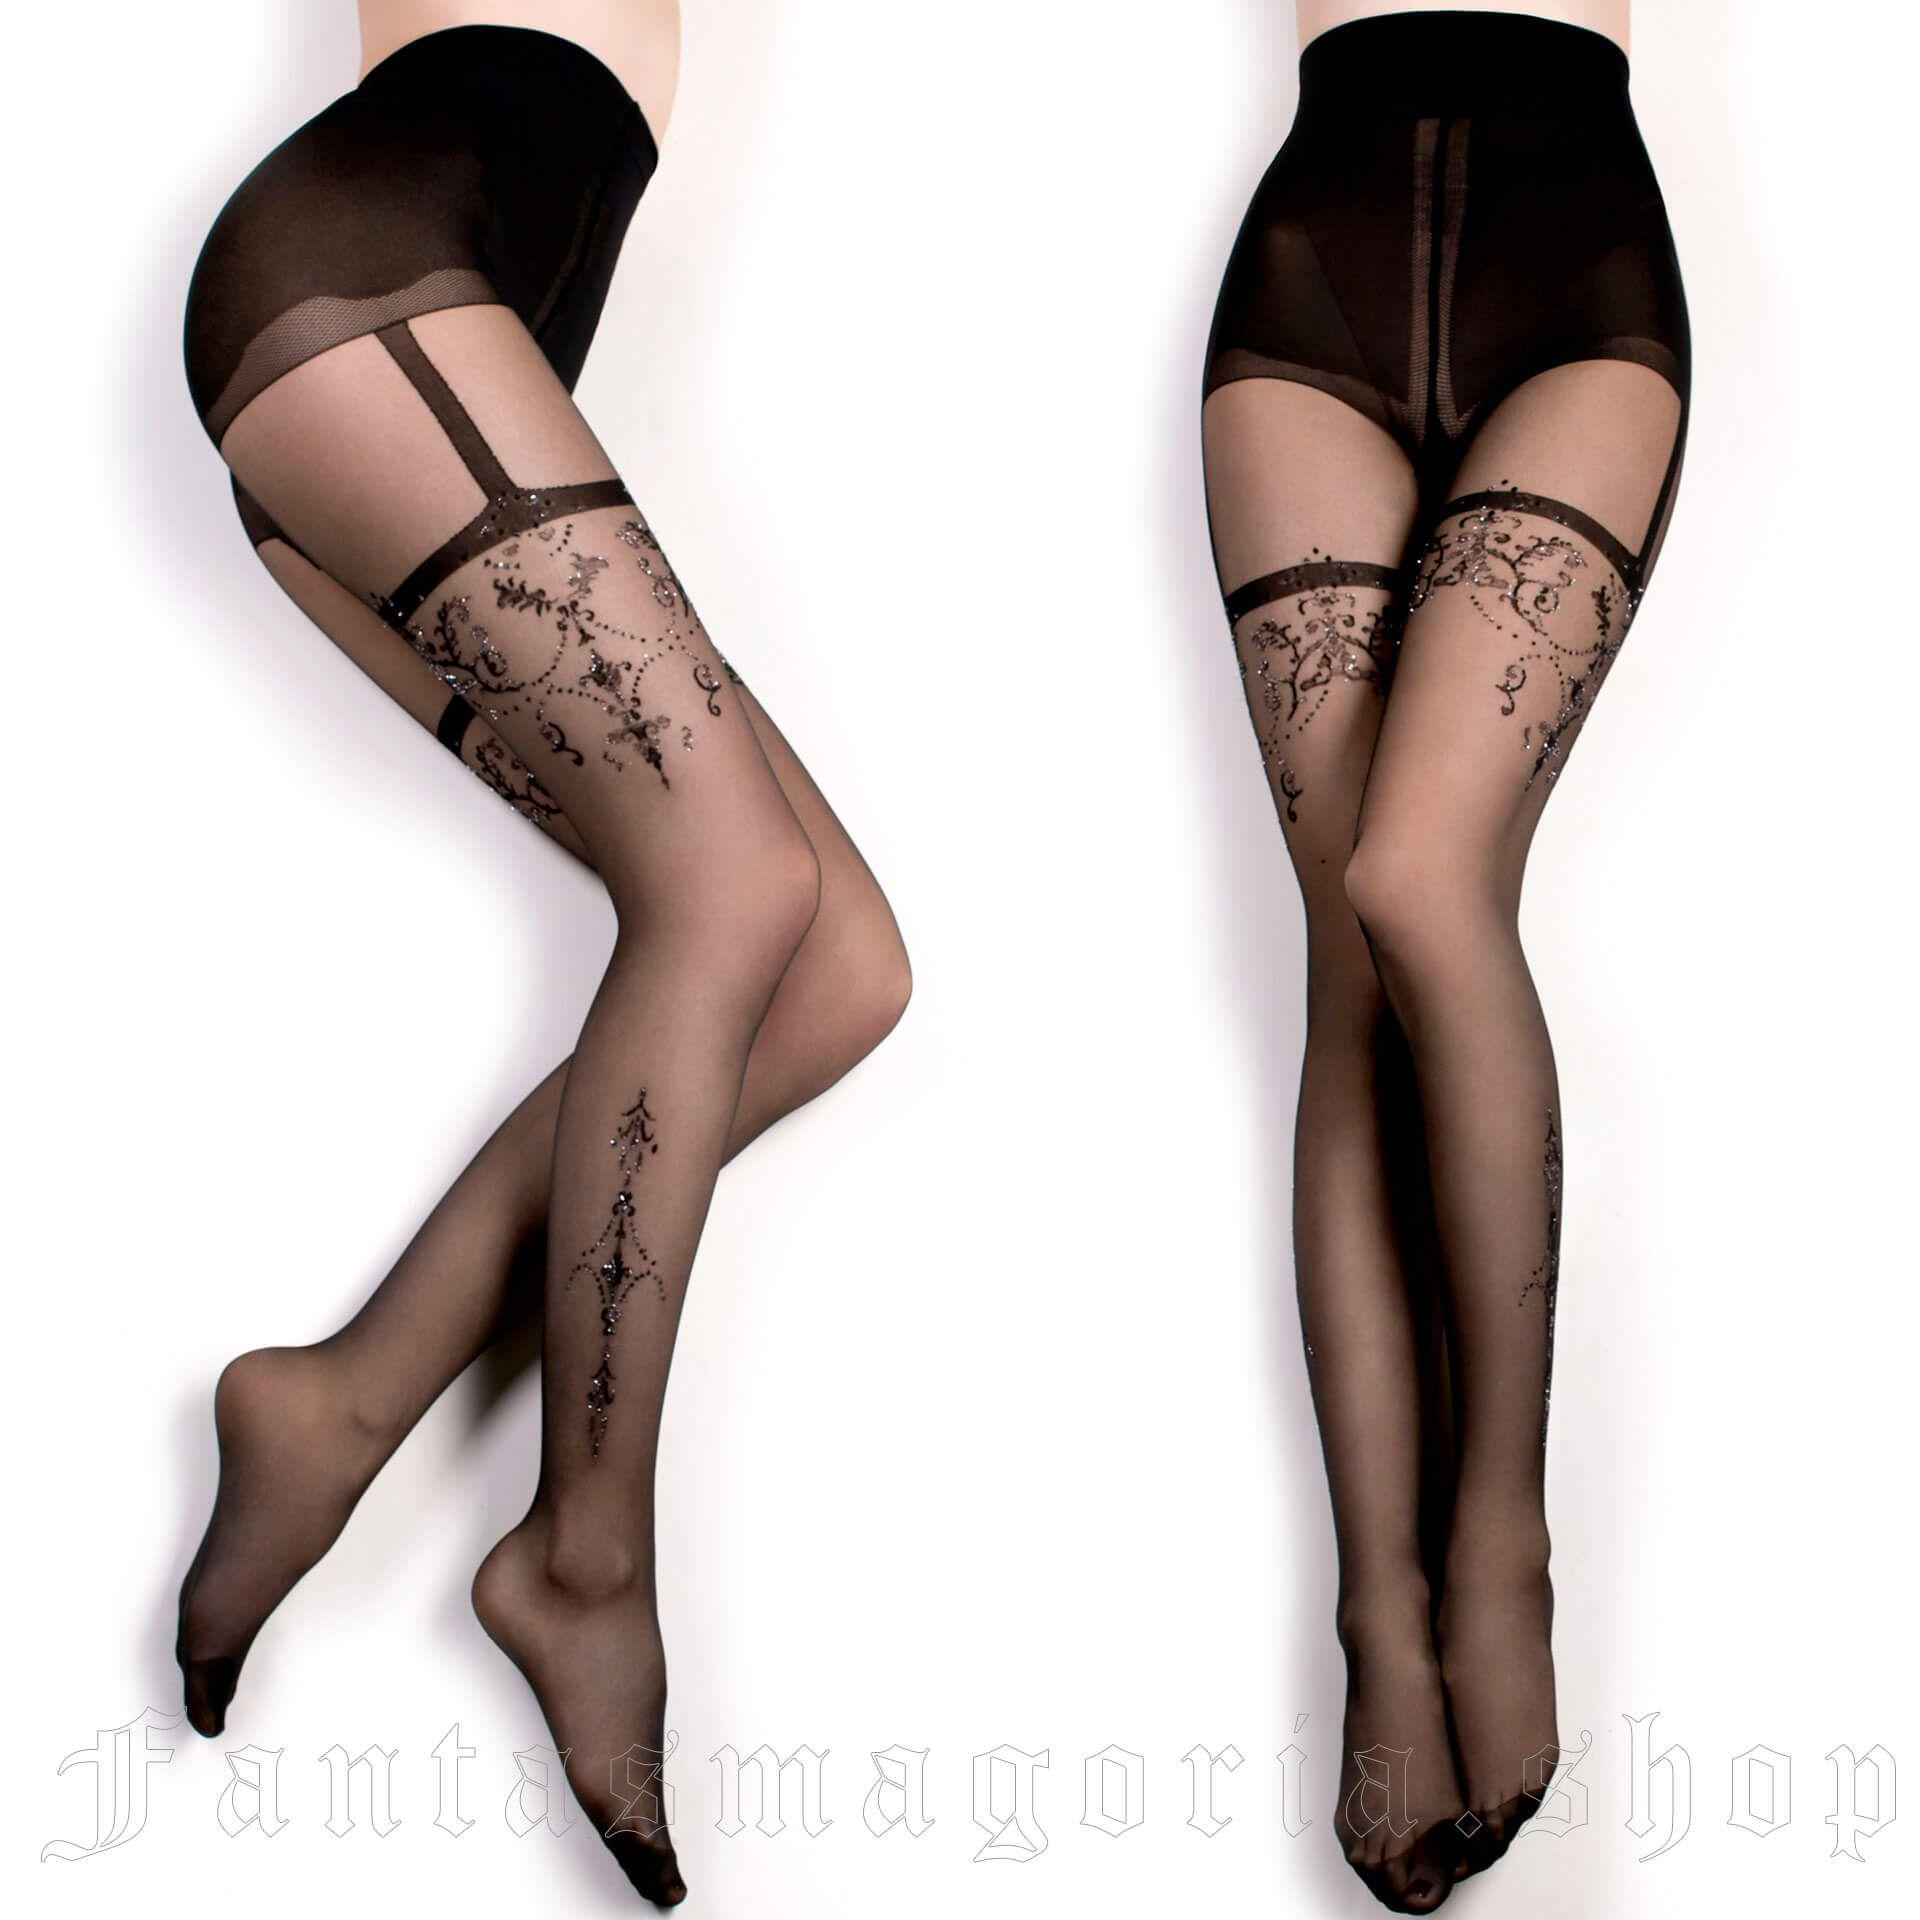 women's Nemesis Tights by BALLERINA brand, code: BAL348/BK